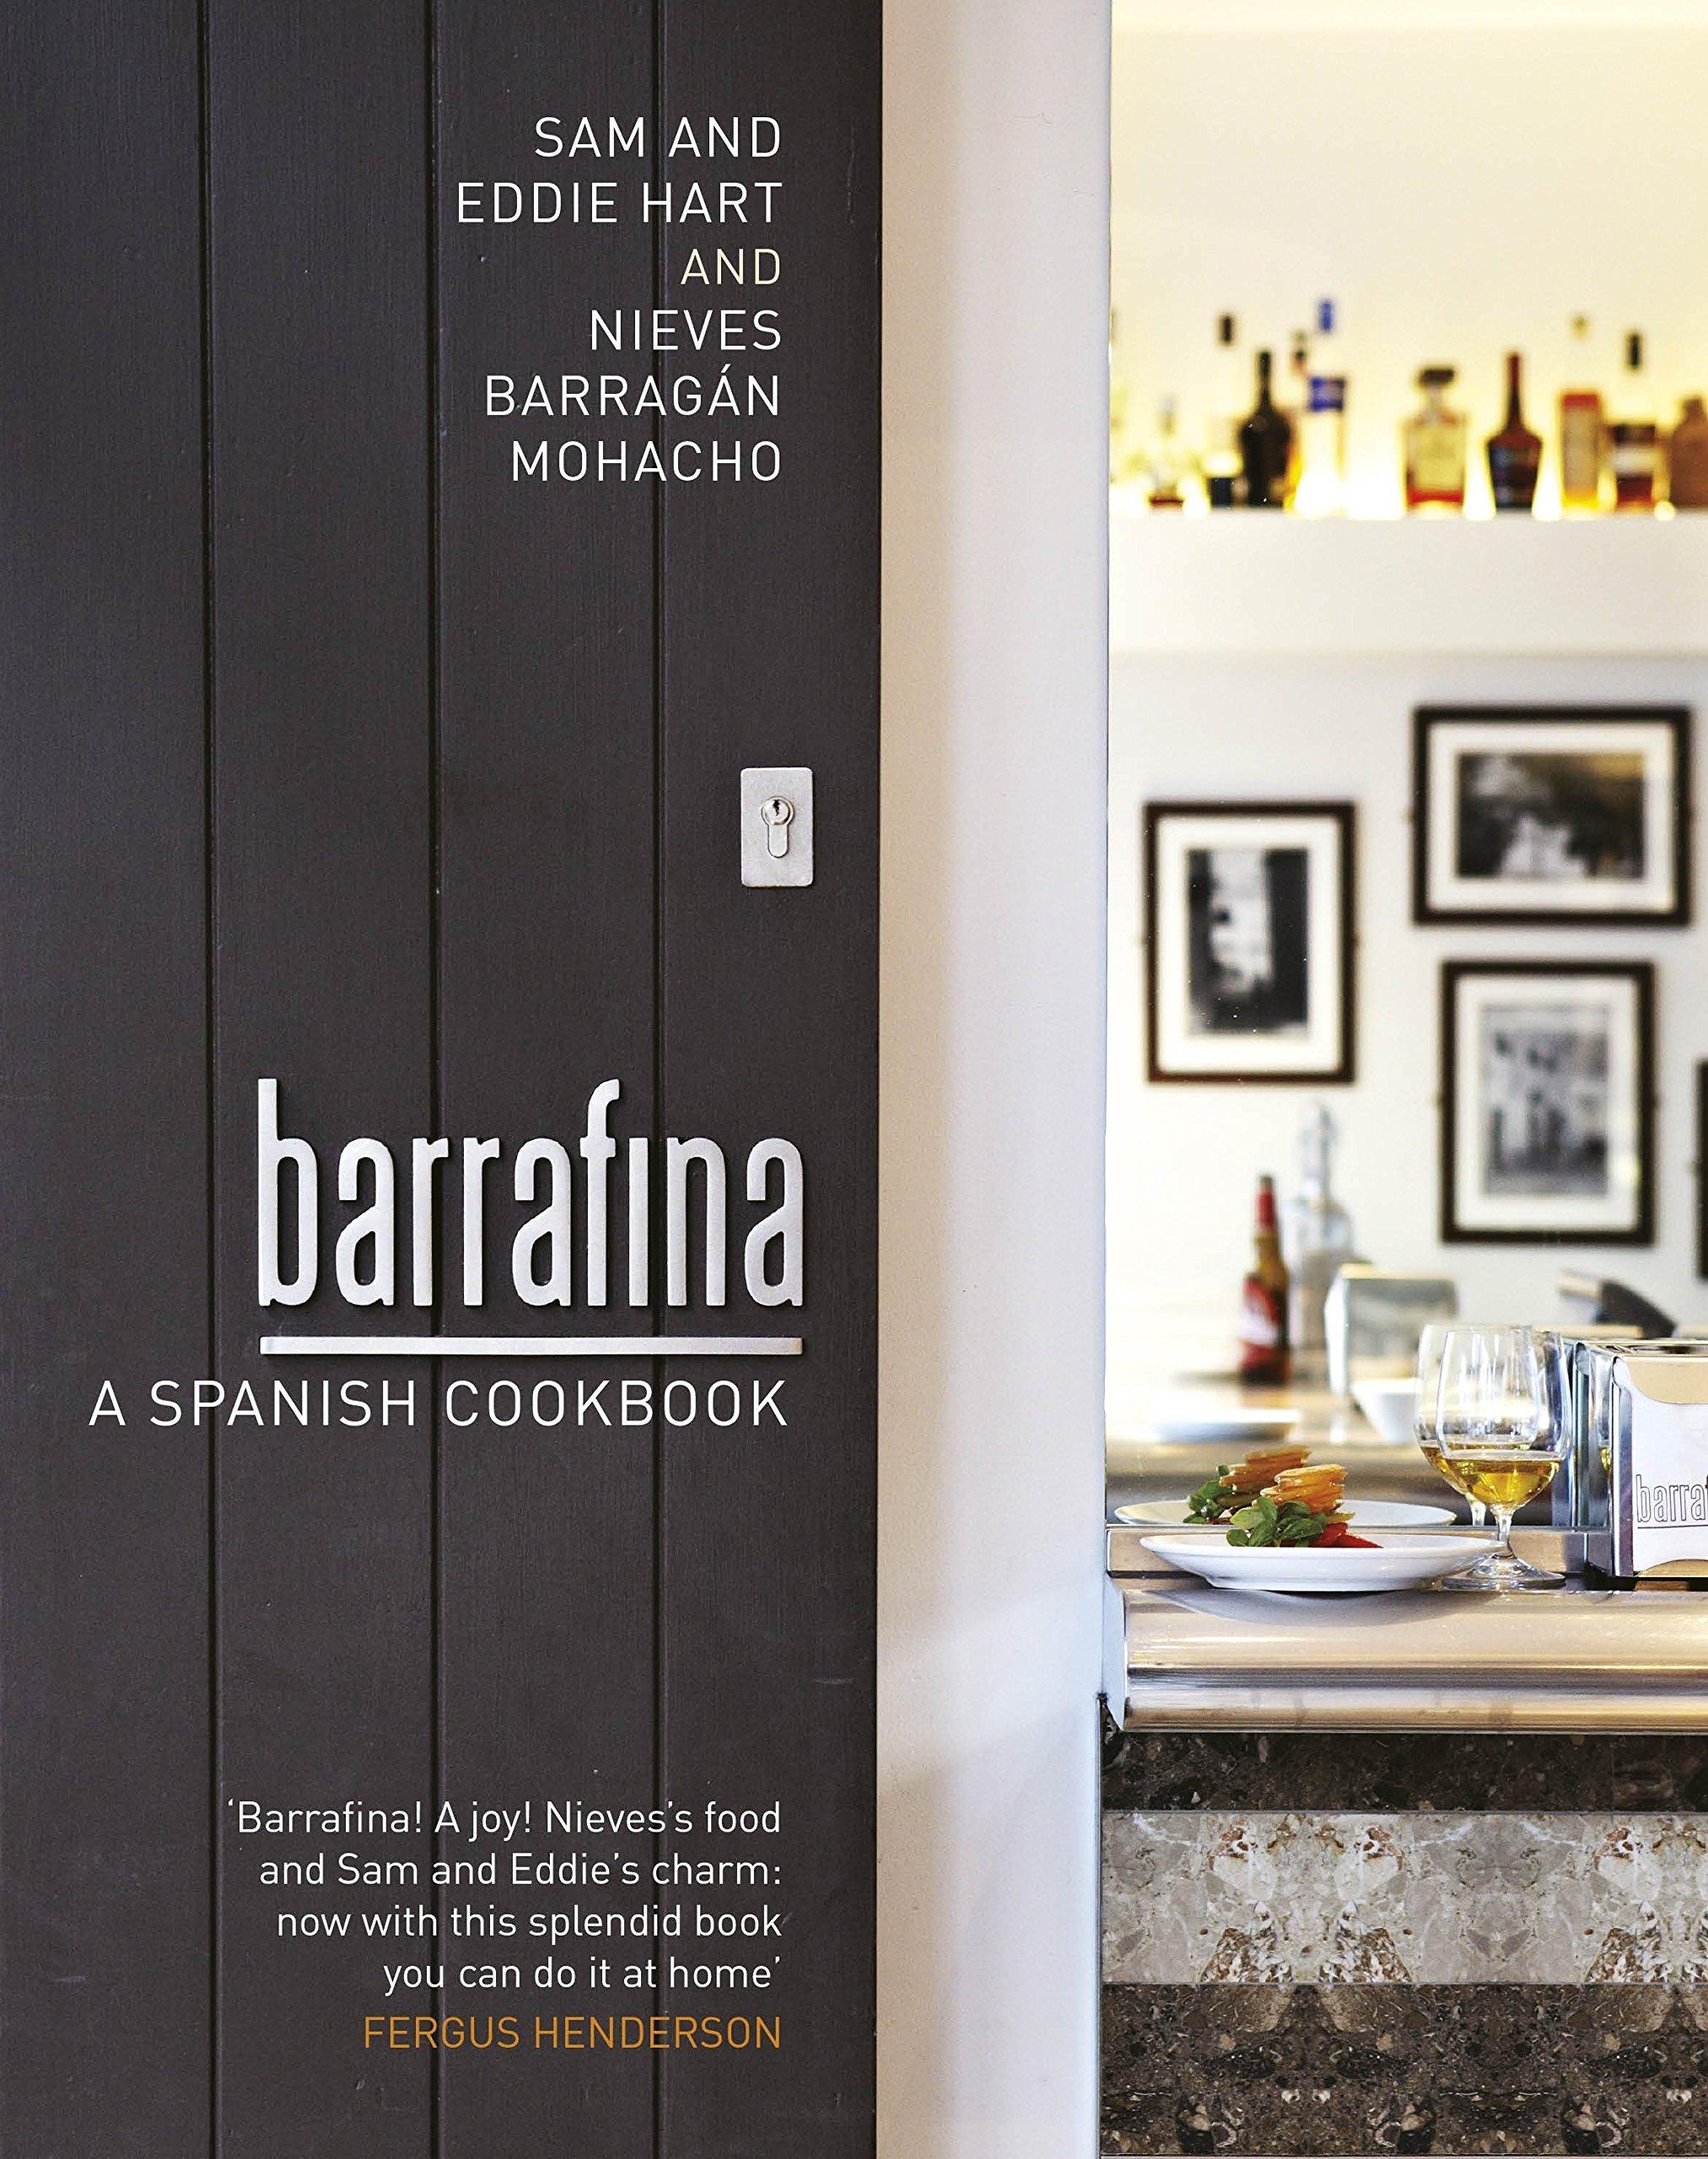 Barrafina: A Spanish Cookbook PDF